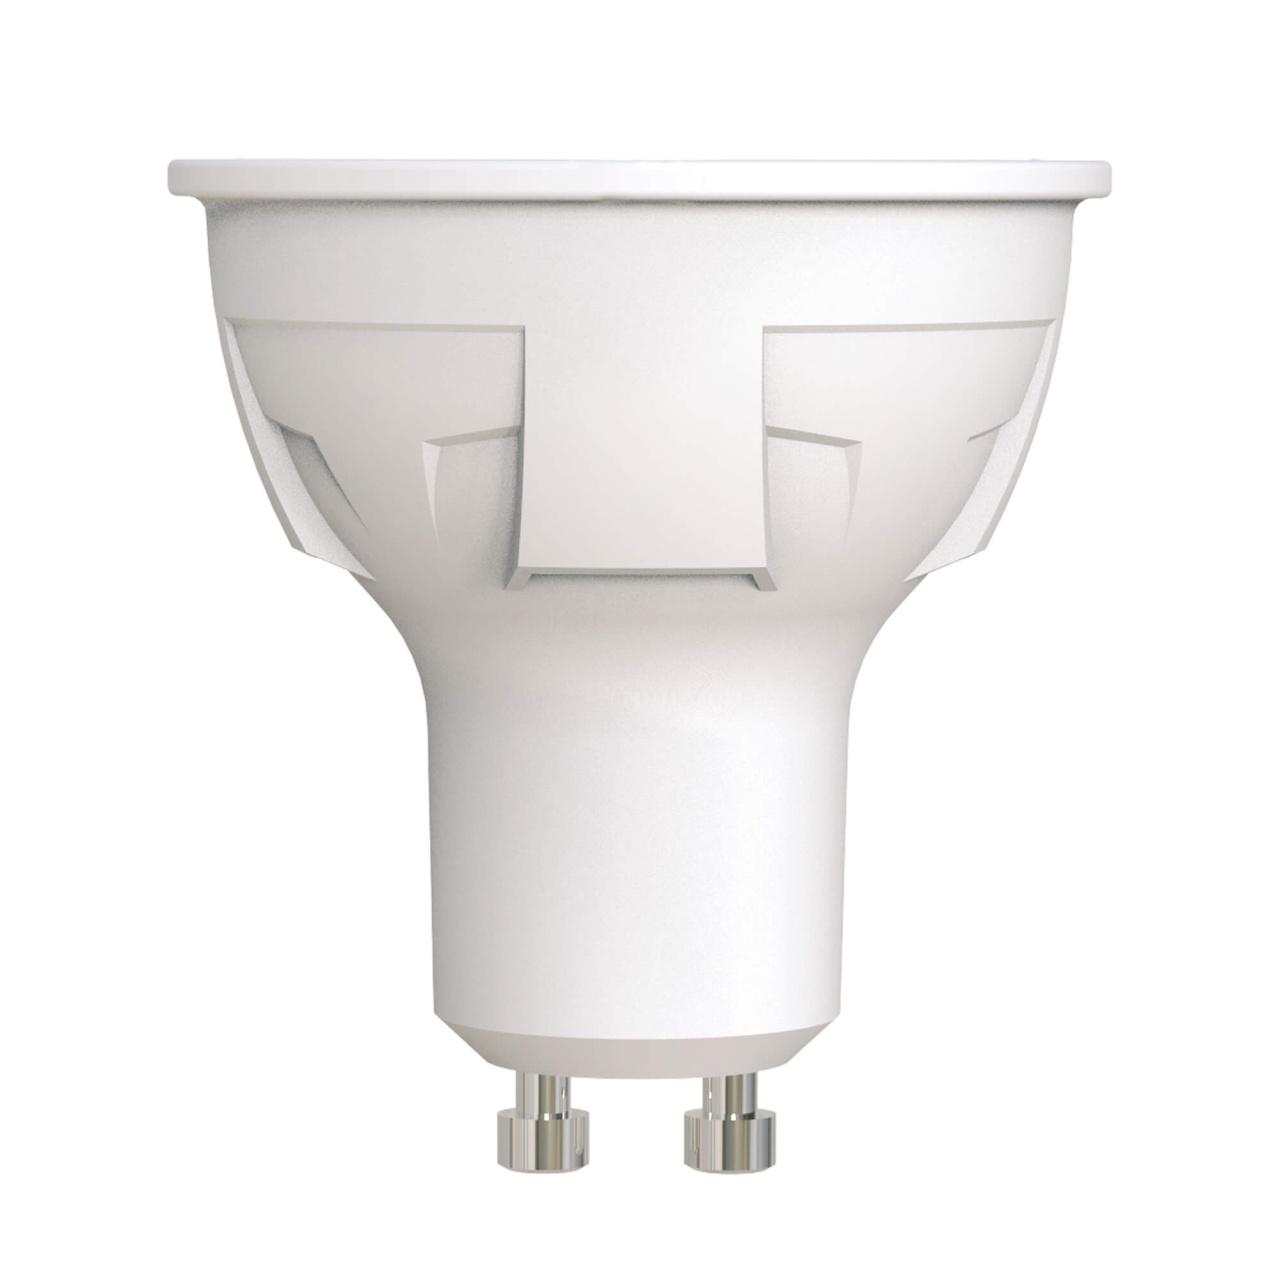 Лампа светодиодная диммируемая (UL-00003990) Uniel GU10 6W 3000K матовая LED-JCDR 6W/WW/GU10/FR/DIM PLP01WH